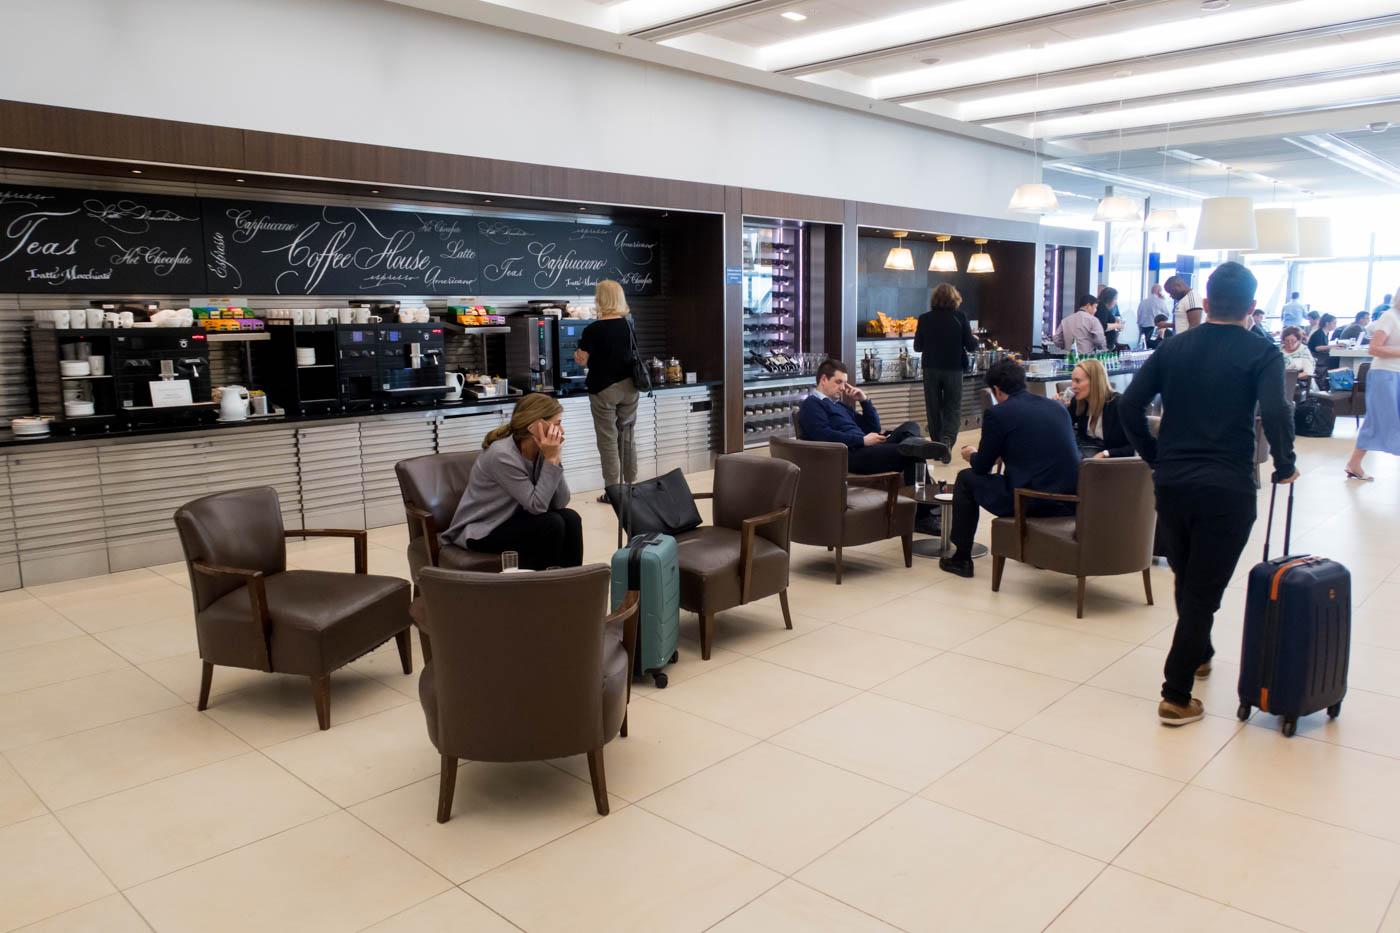 Coffee Area in British Airways Lounge at Heathrow